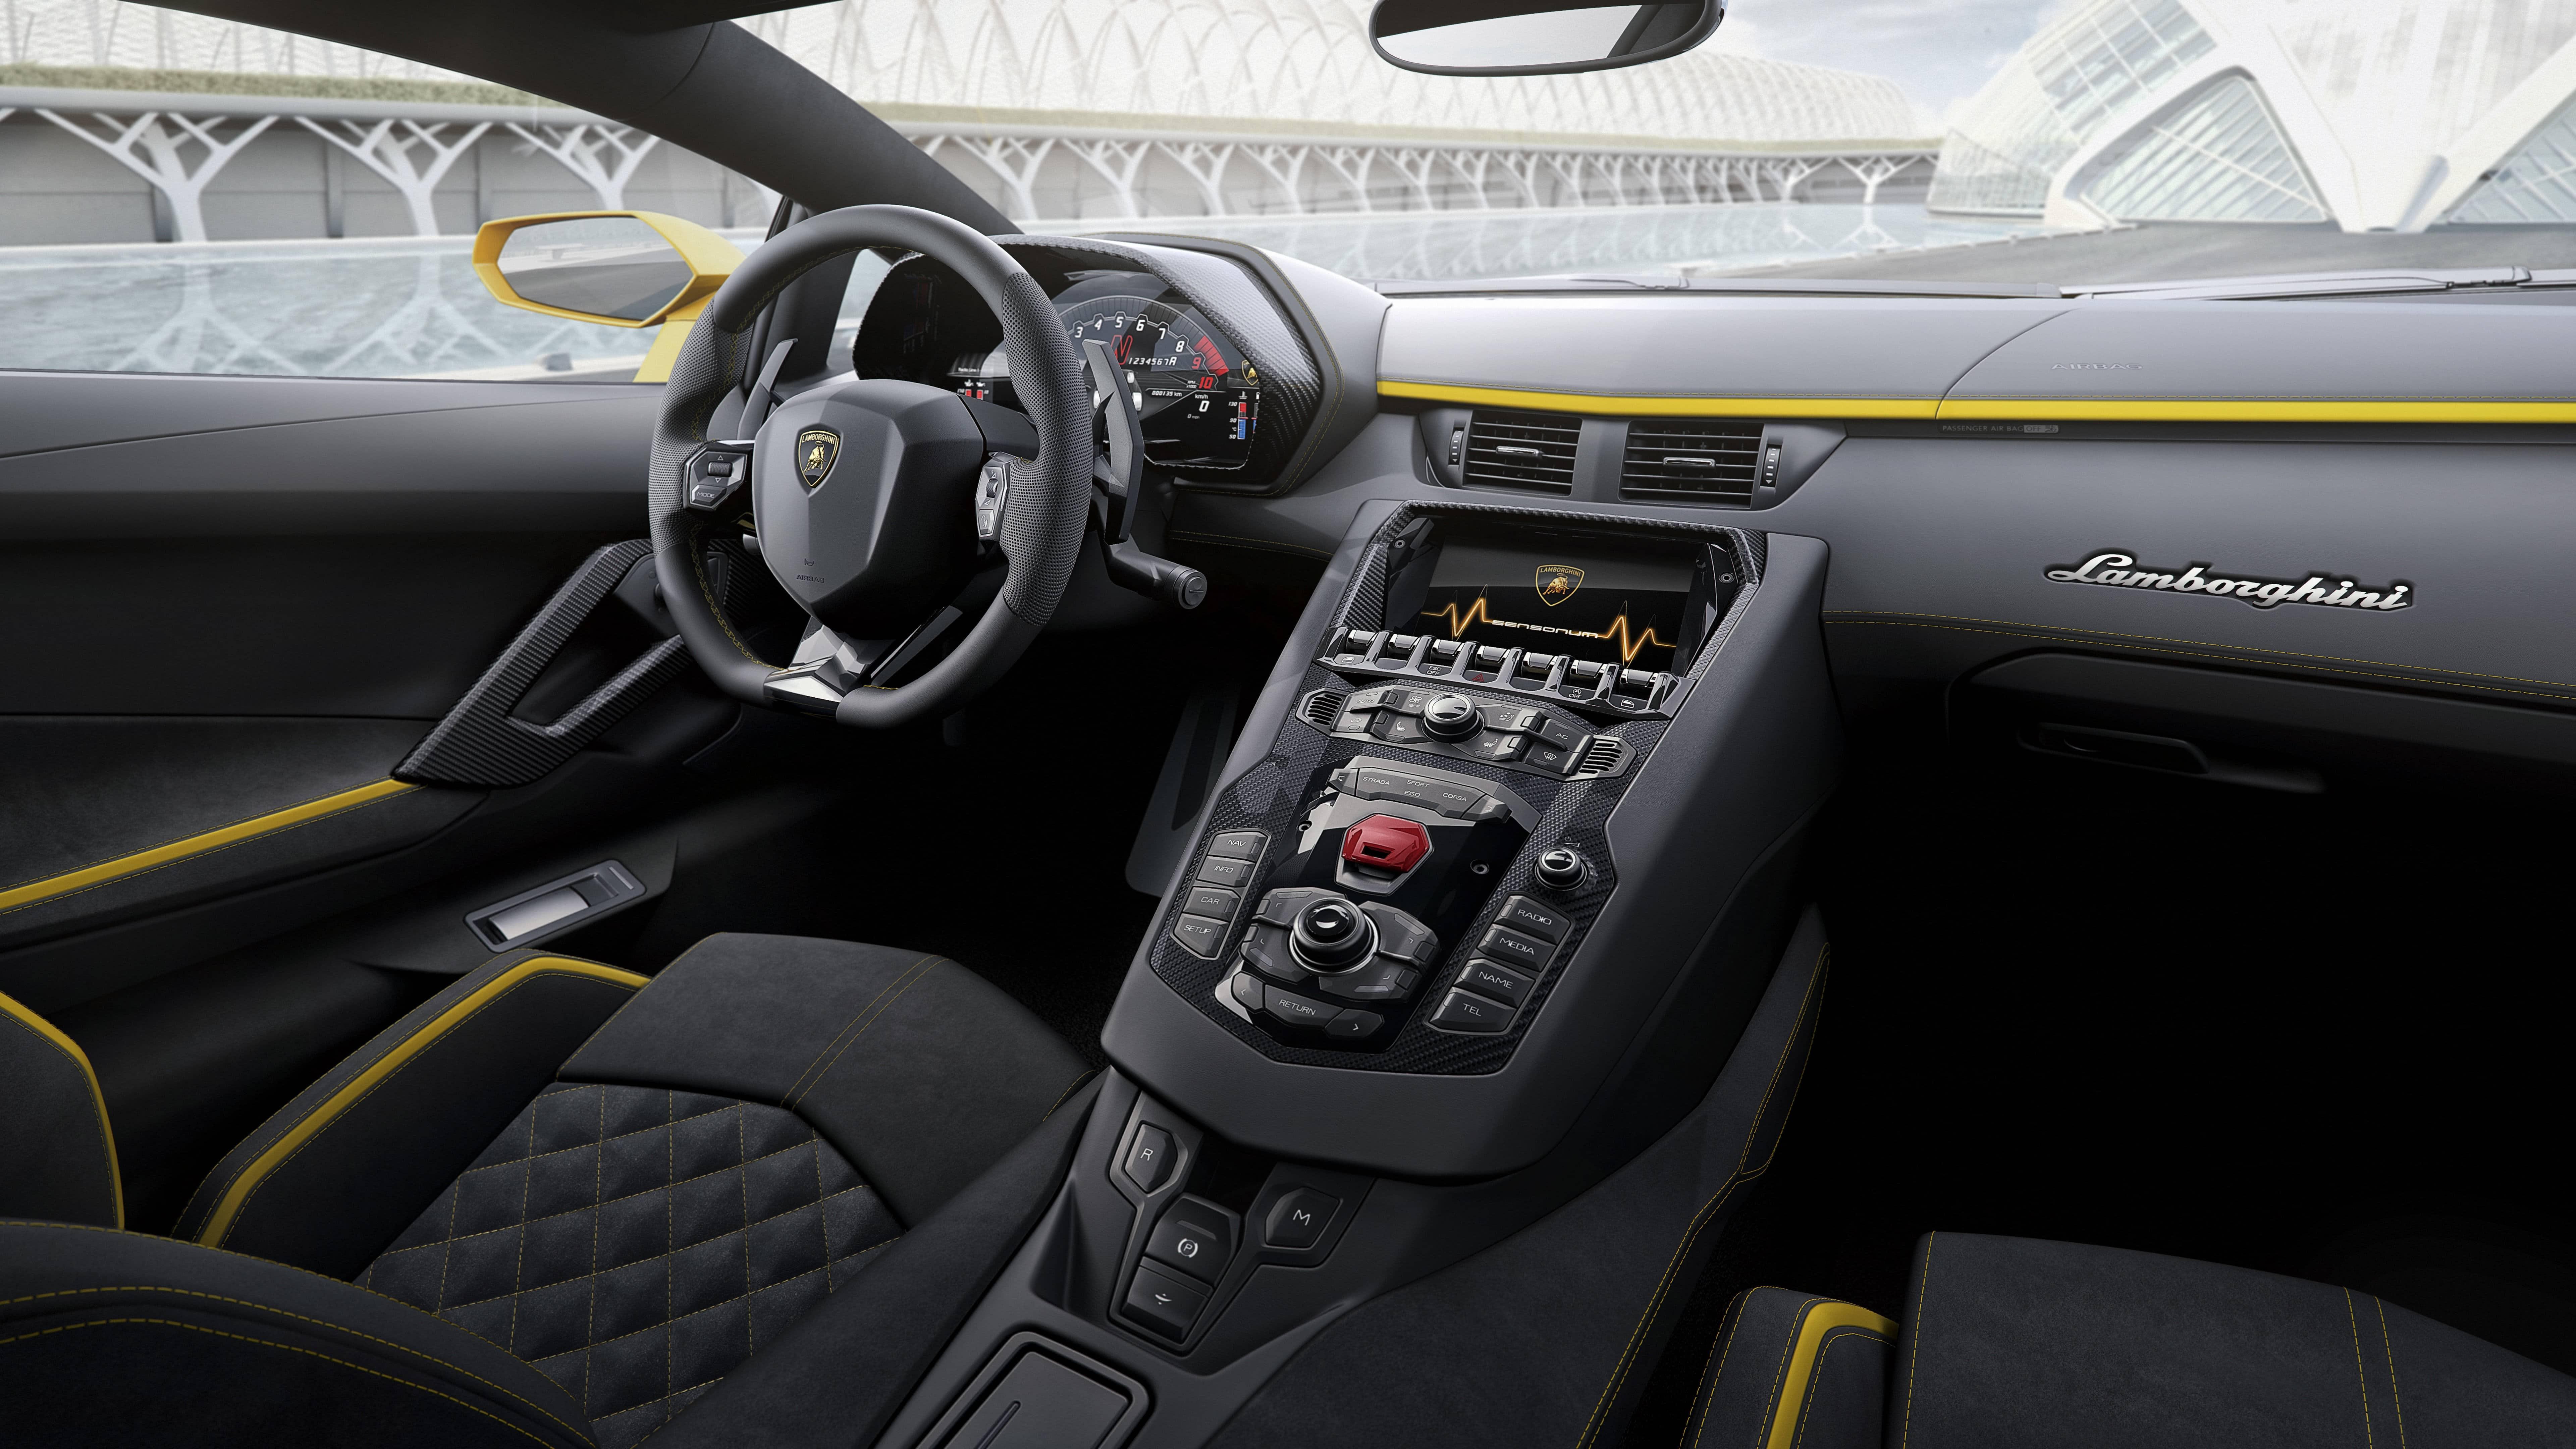 Lamborghini Aventador S 2017 Interior Uhd 8k Wallpaper Pixelz